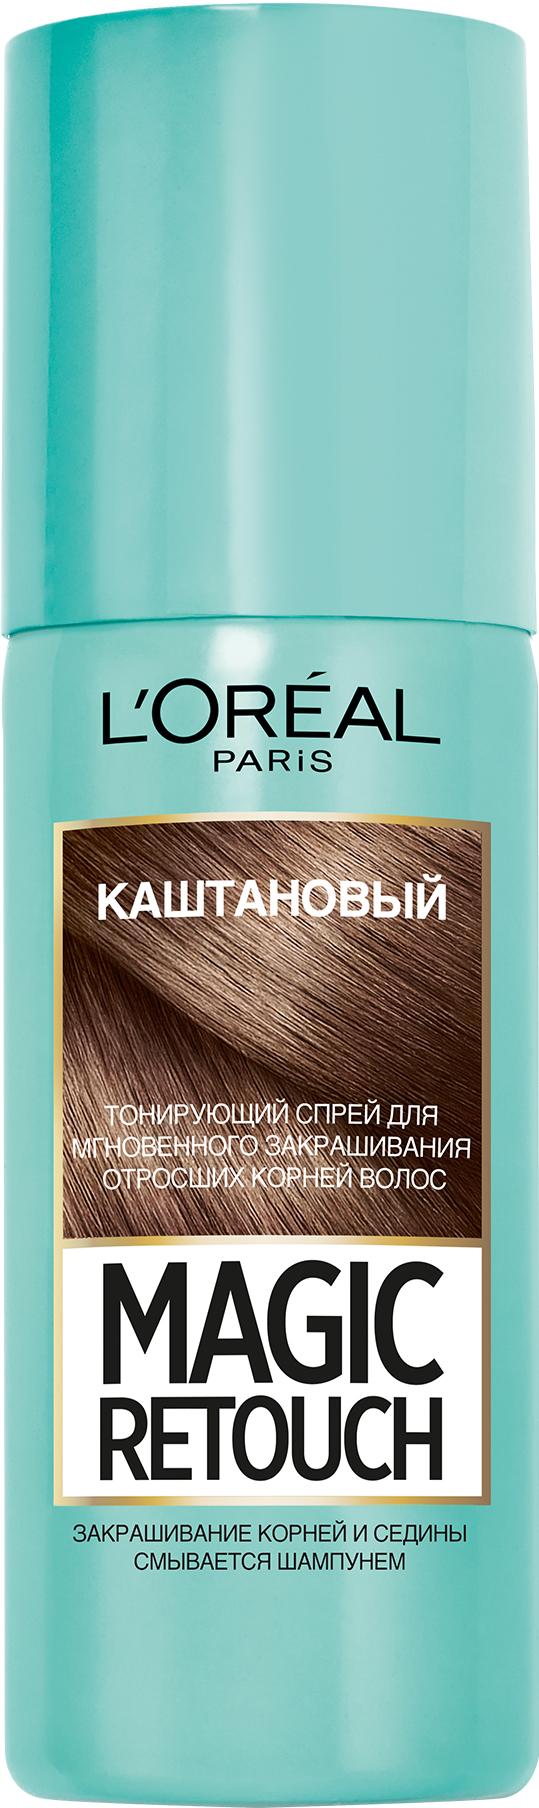 Миниатюра Спрей для волос L'Oreal Paris MAGIC RETOUCH 3 Каштан Тонирующий №1